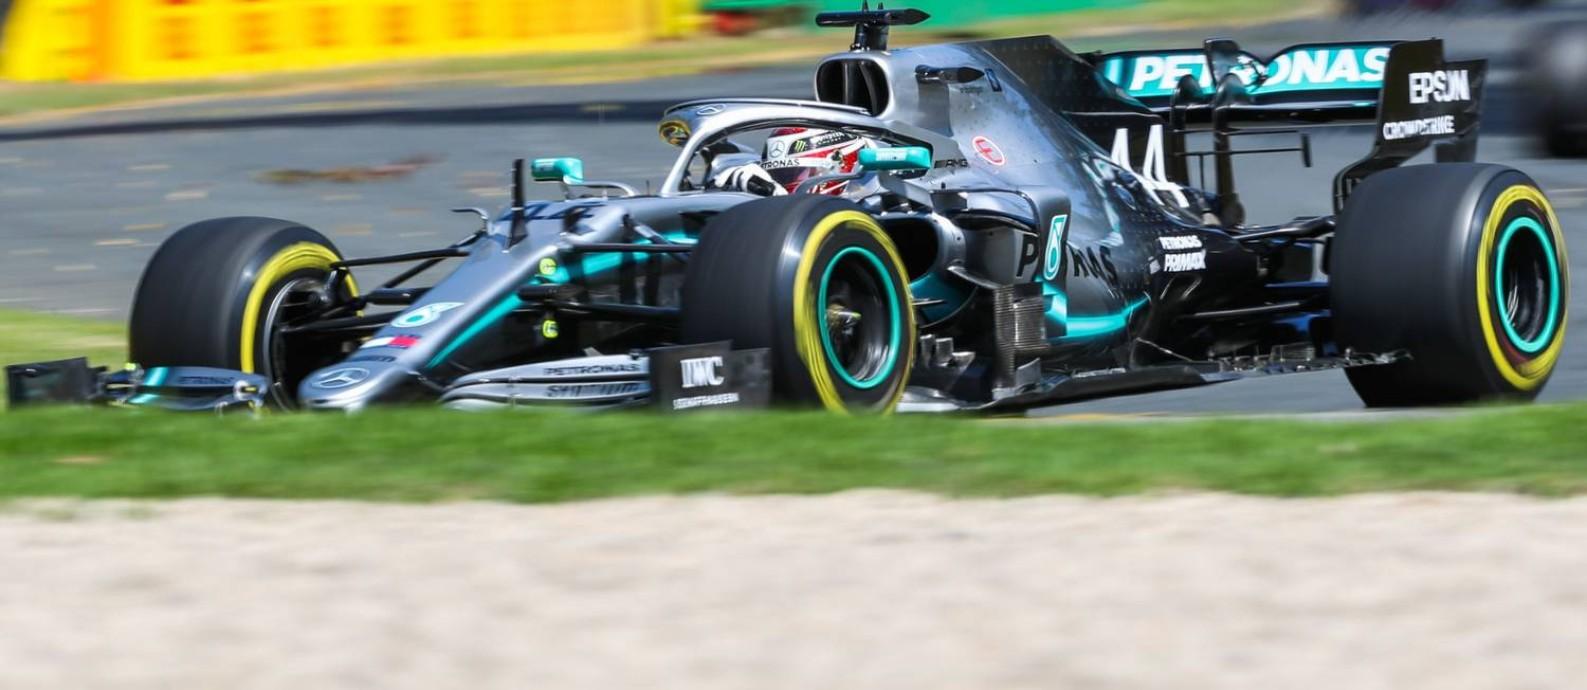 Lewis Hamilton acelera durante os treinos livres desta sexta no GP de Melbourne de Fórmula 1 Foto: ASANKA BRENDON RATNAYAKE / AFP